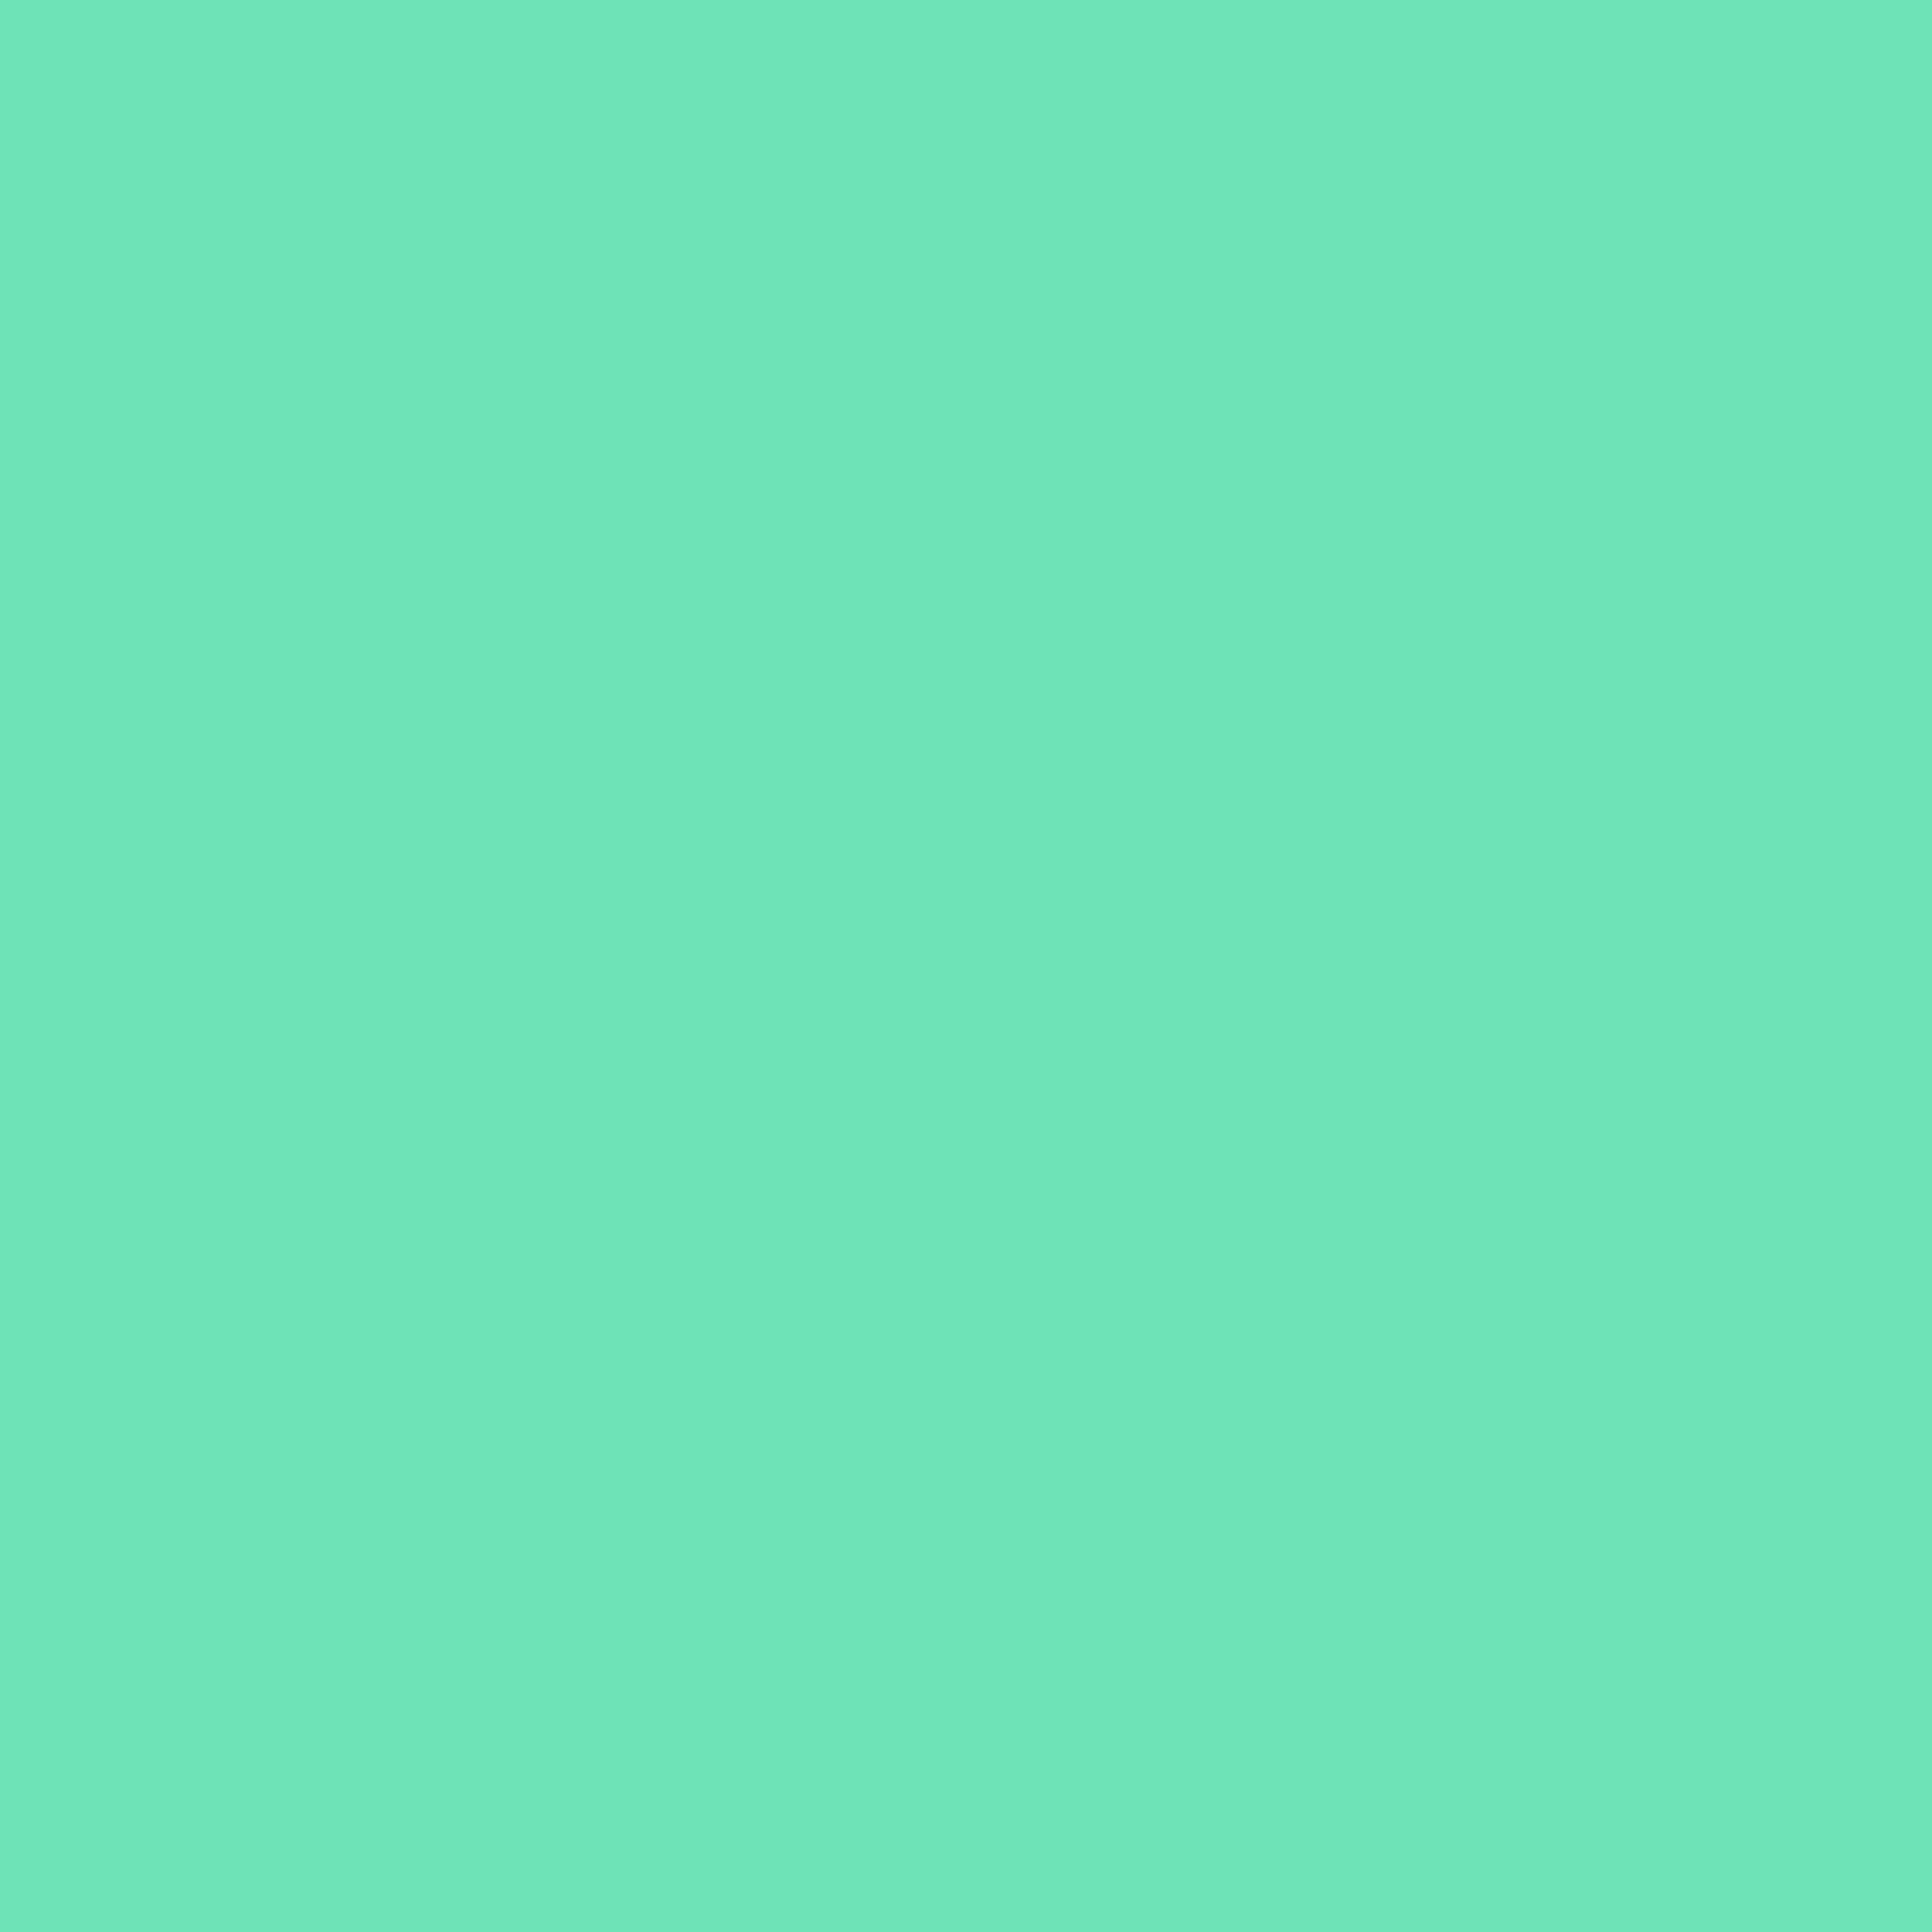 Mint Circle